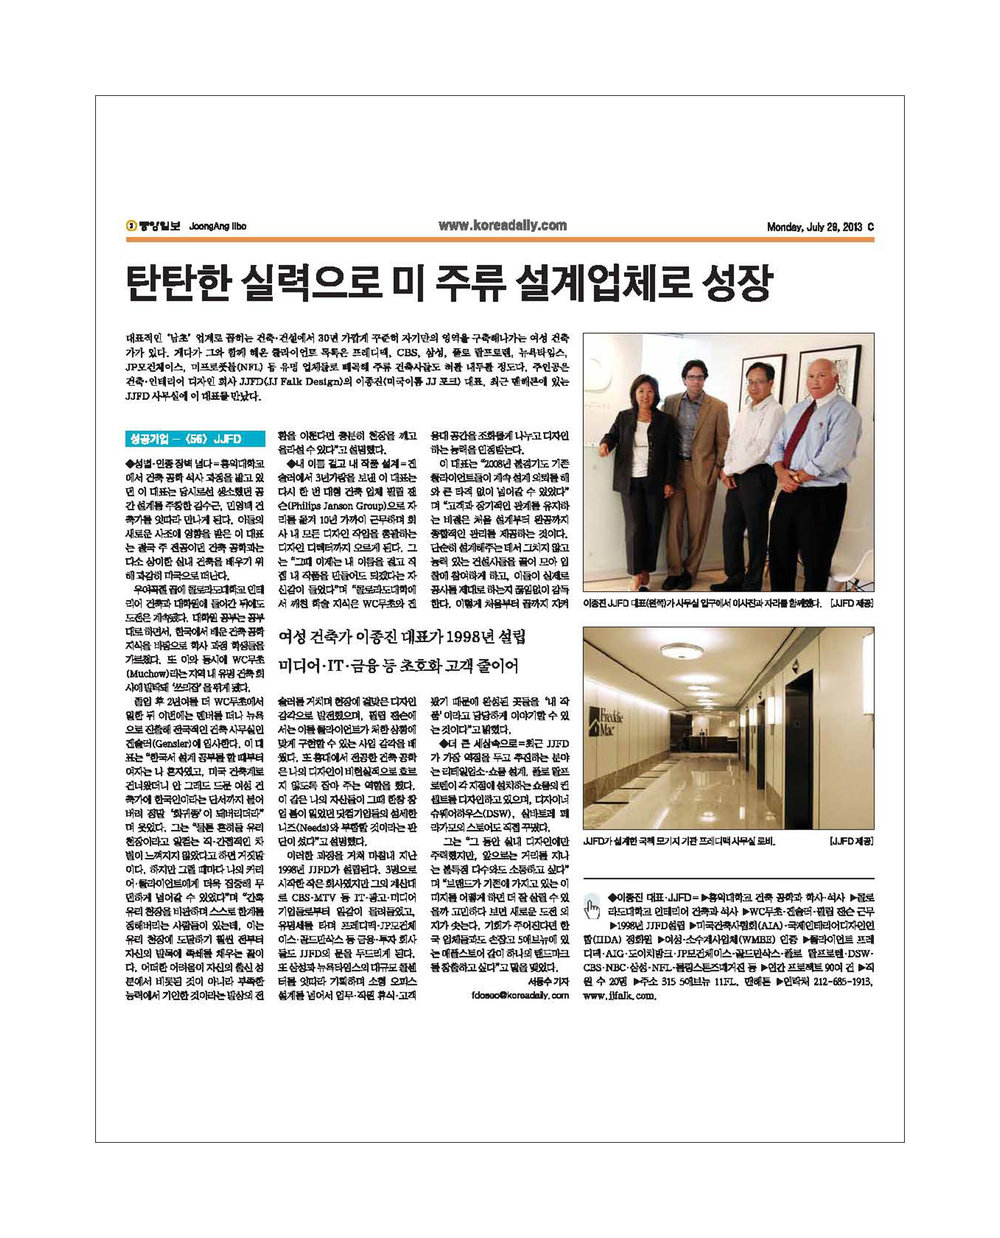 2013 Korea Daily